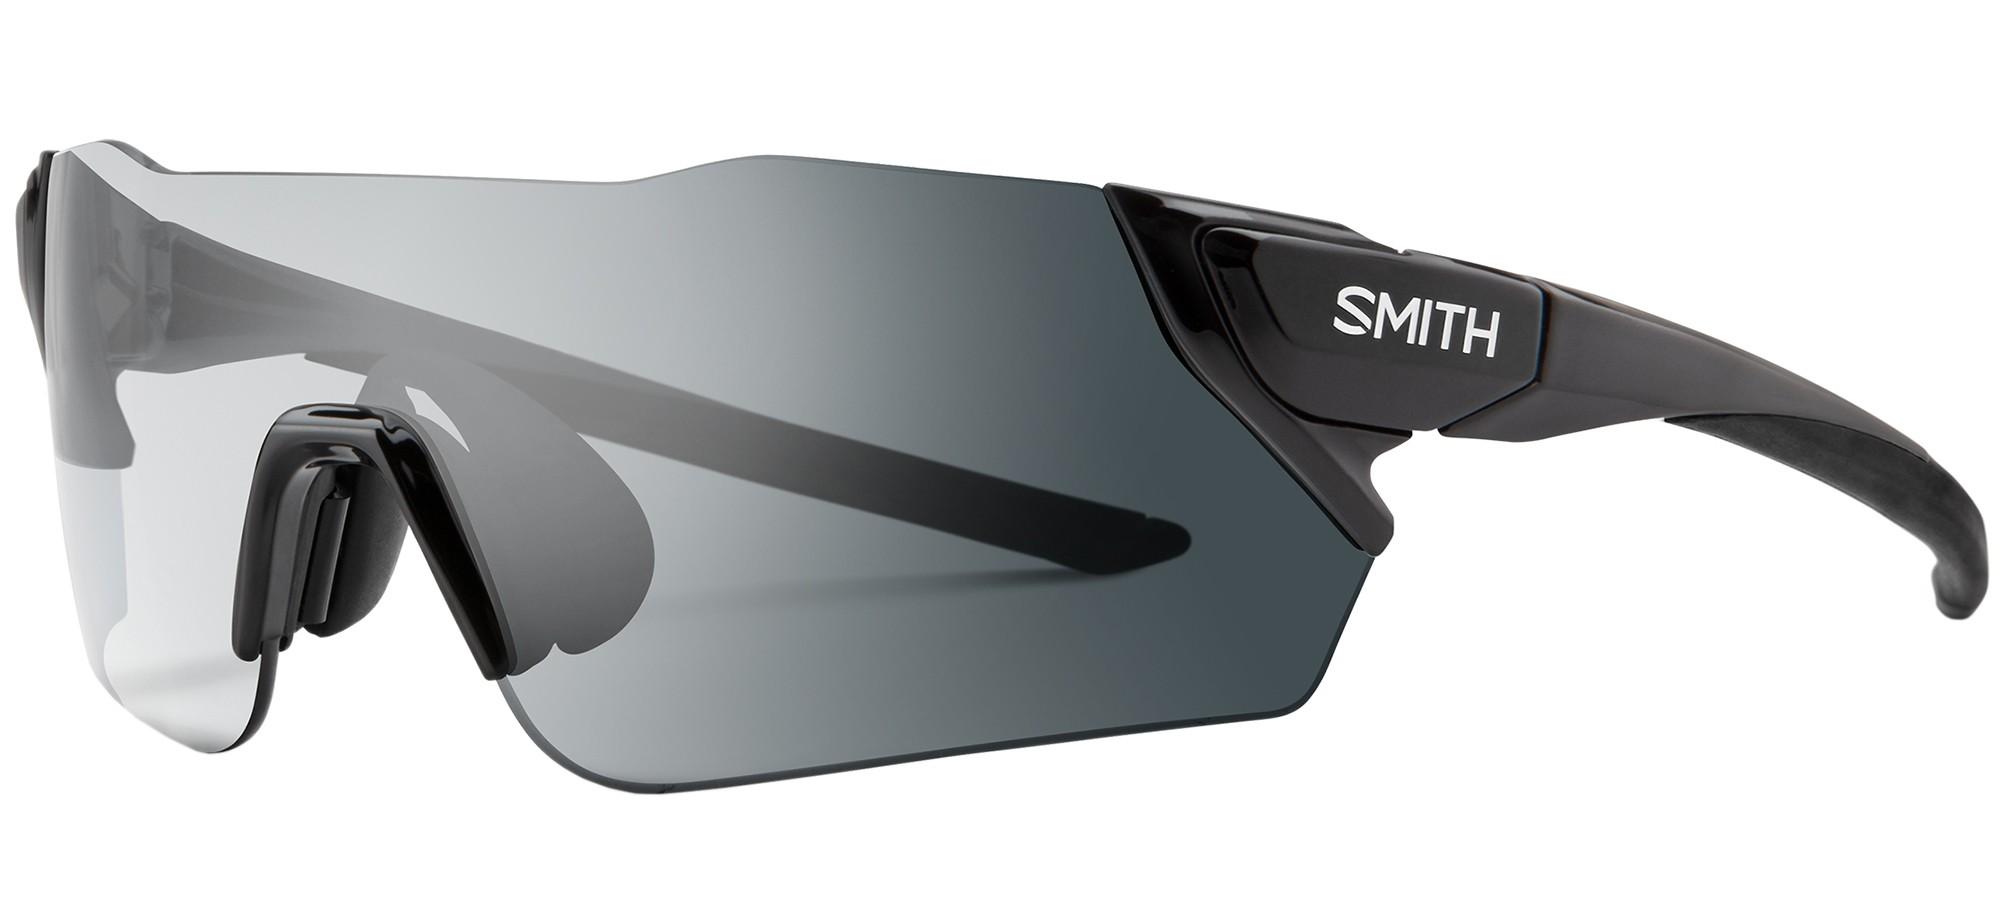 Smith Optics sunglasses ATTACK